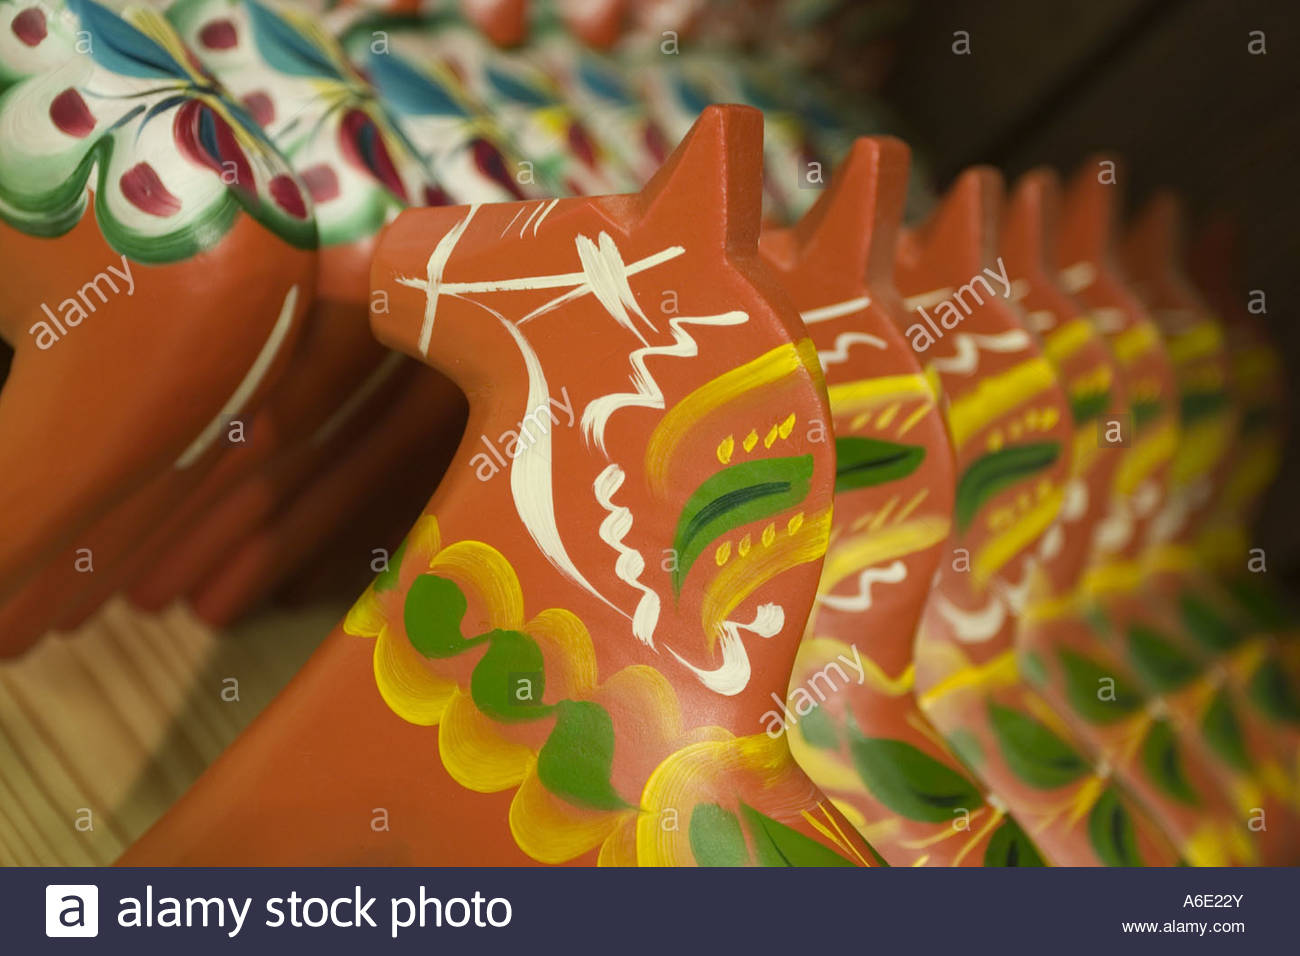 Rows of painted dalarna horses - Stock Image